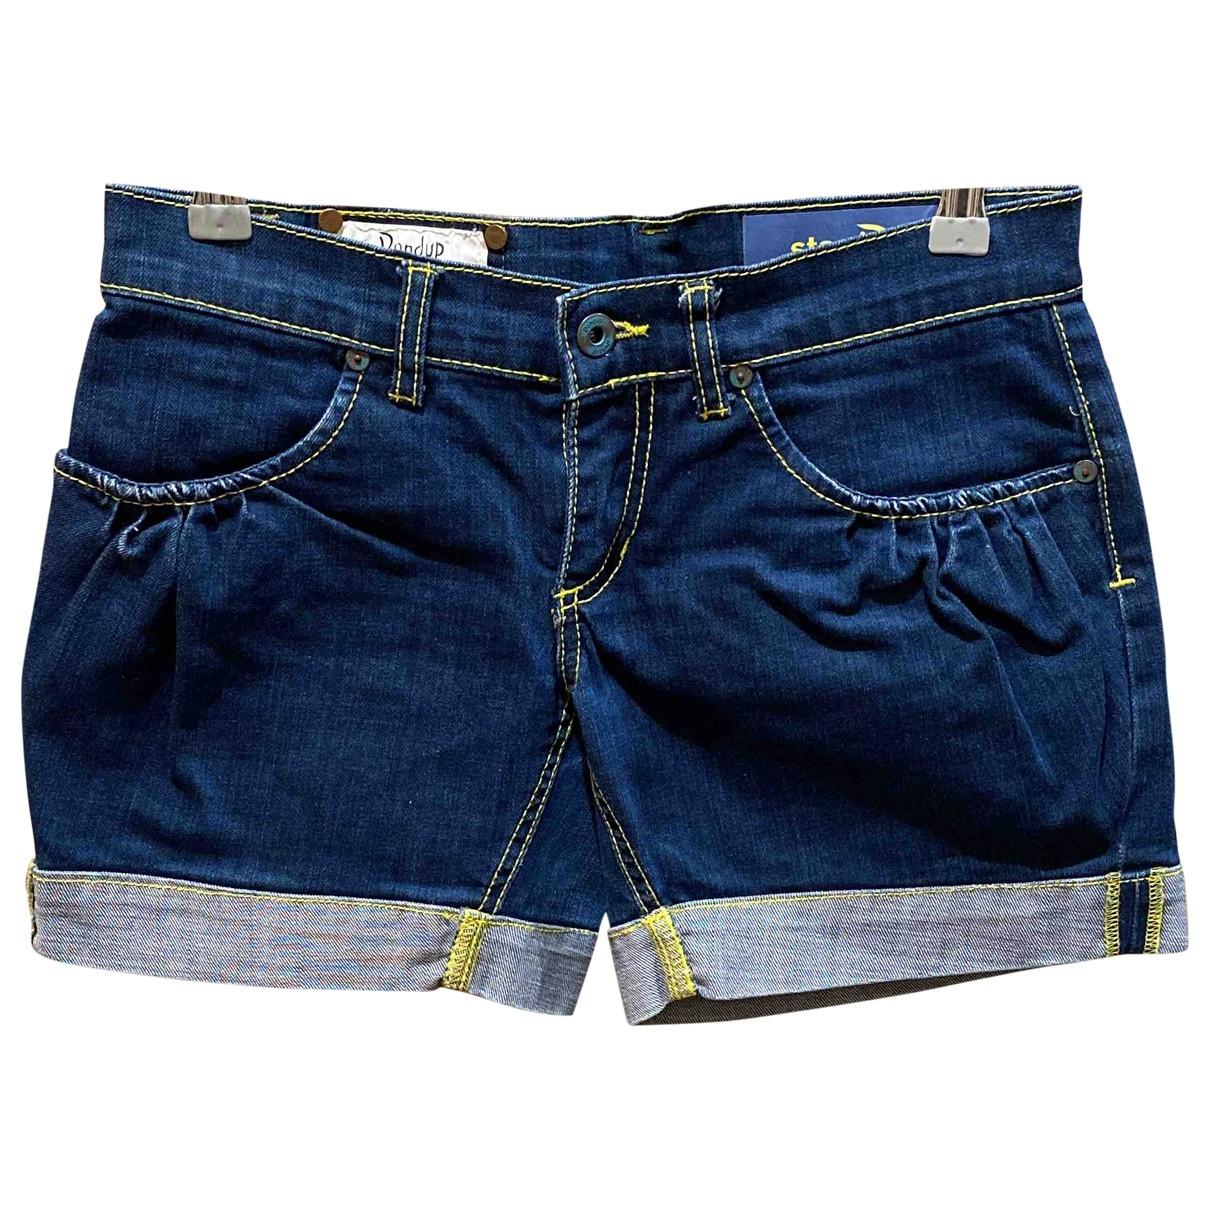 Dondup \N Blue Denim - Jeans Shorts for Women 38 IT